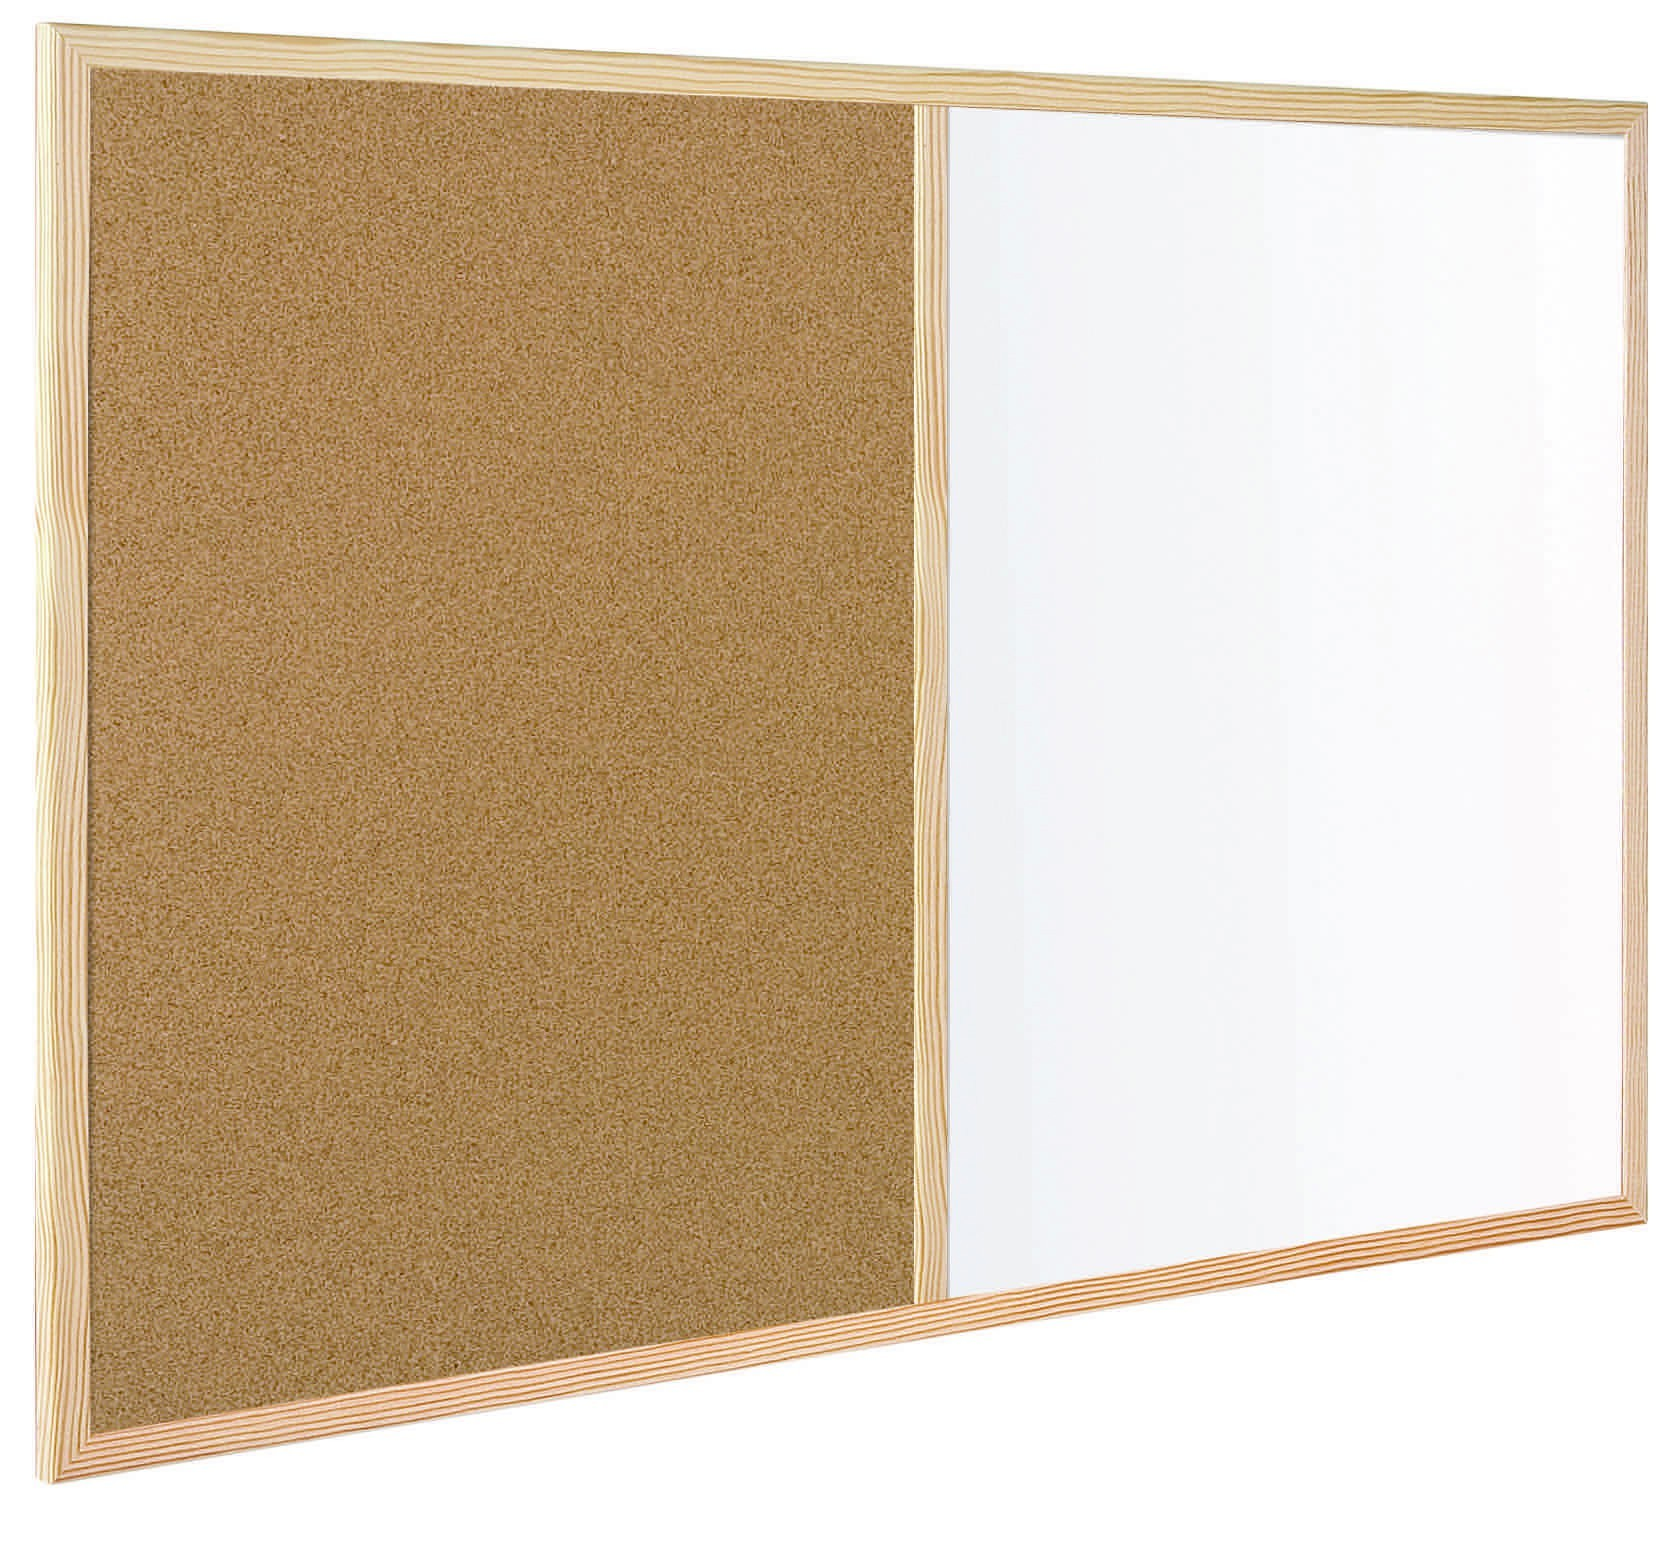 SLATE COMBO: HALF NATURAL CORK-HALF MELAMINE 90x60cm 1 Unit